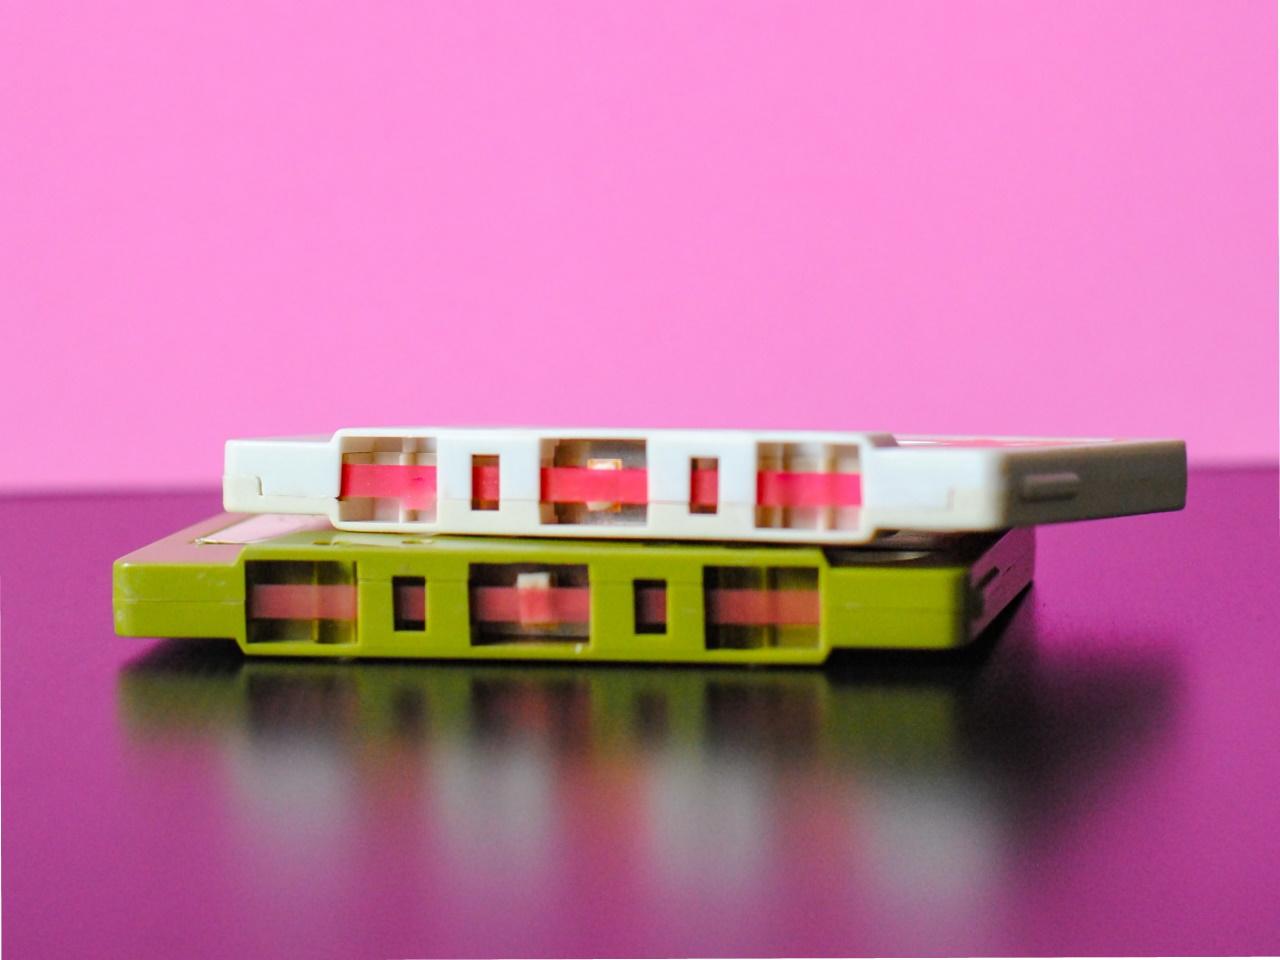 Tapeline cassette duplication